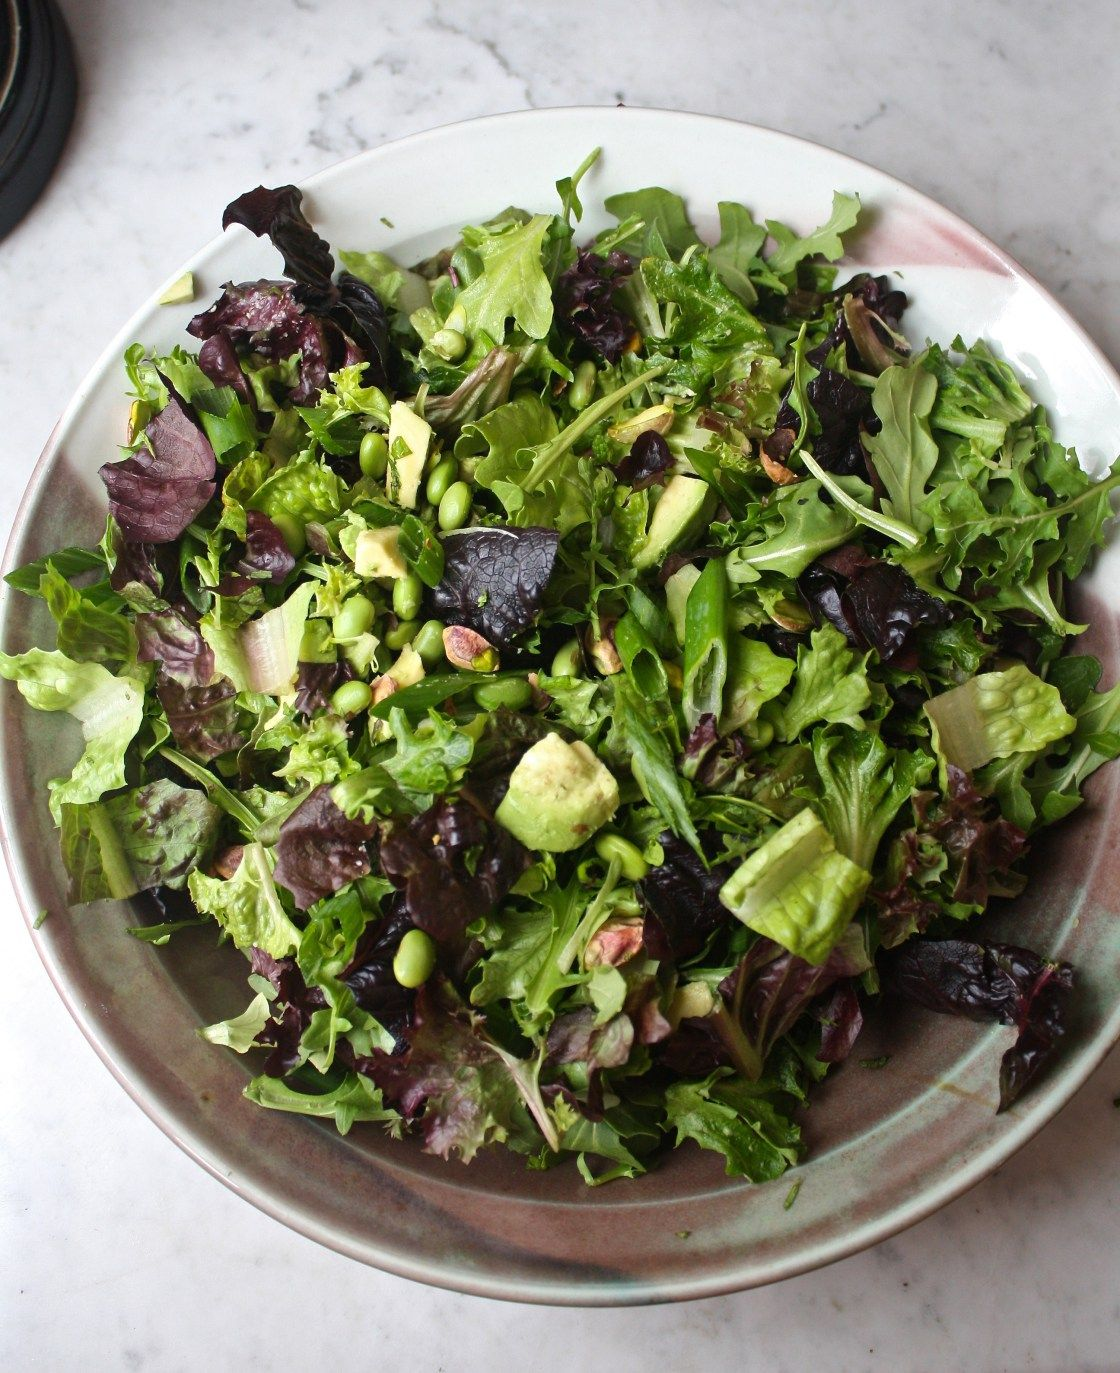 Light & Refreshing!  Herbed Salad with Grapefruit Cardamom Vinaigrette | Zestful Kitchen